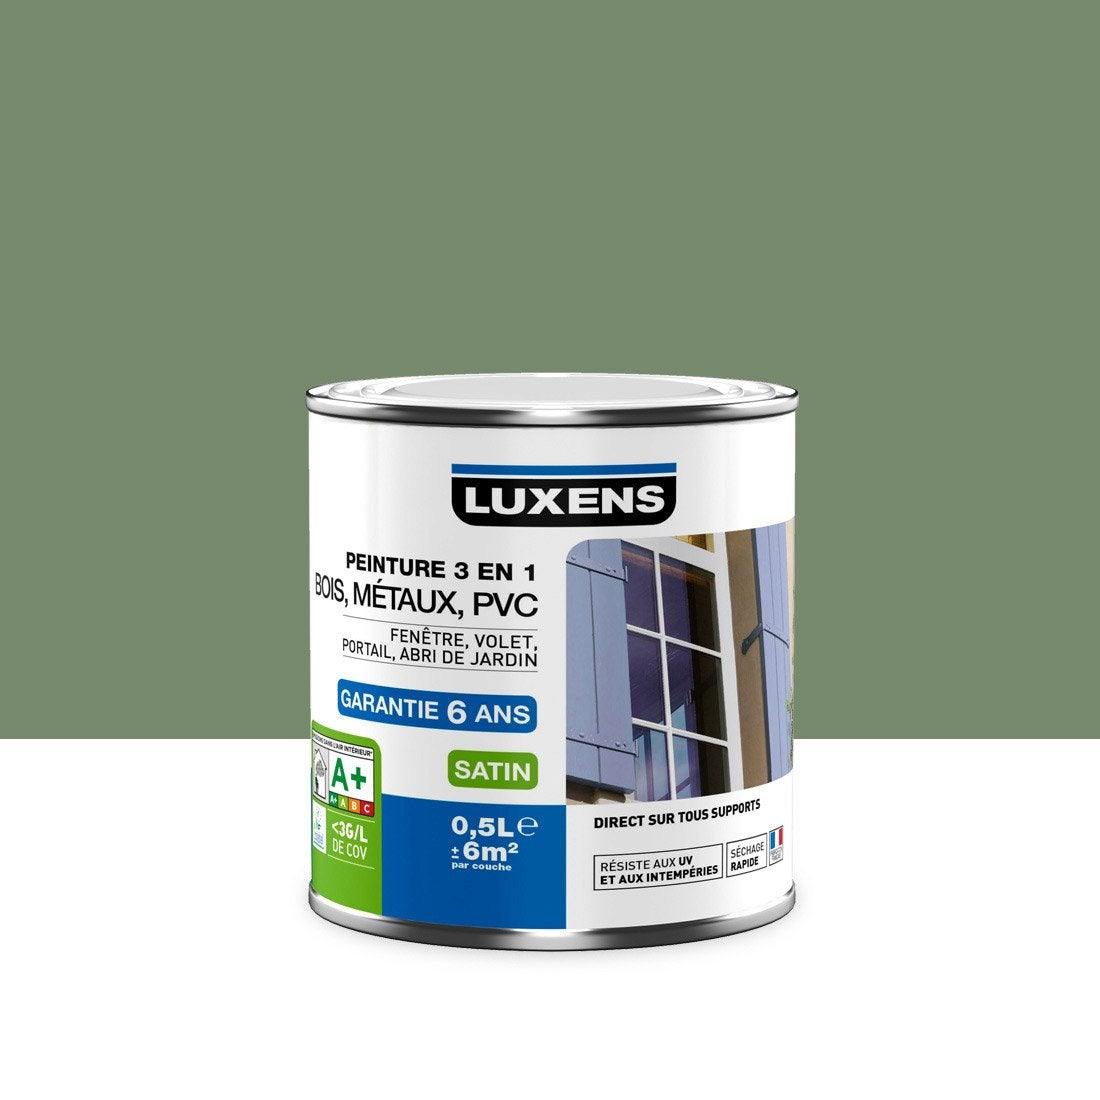 peinture multimat riau ext rieur 3 en 1 luxens vert. Black Bedroom Furniture Sets. Home Design Ideas